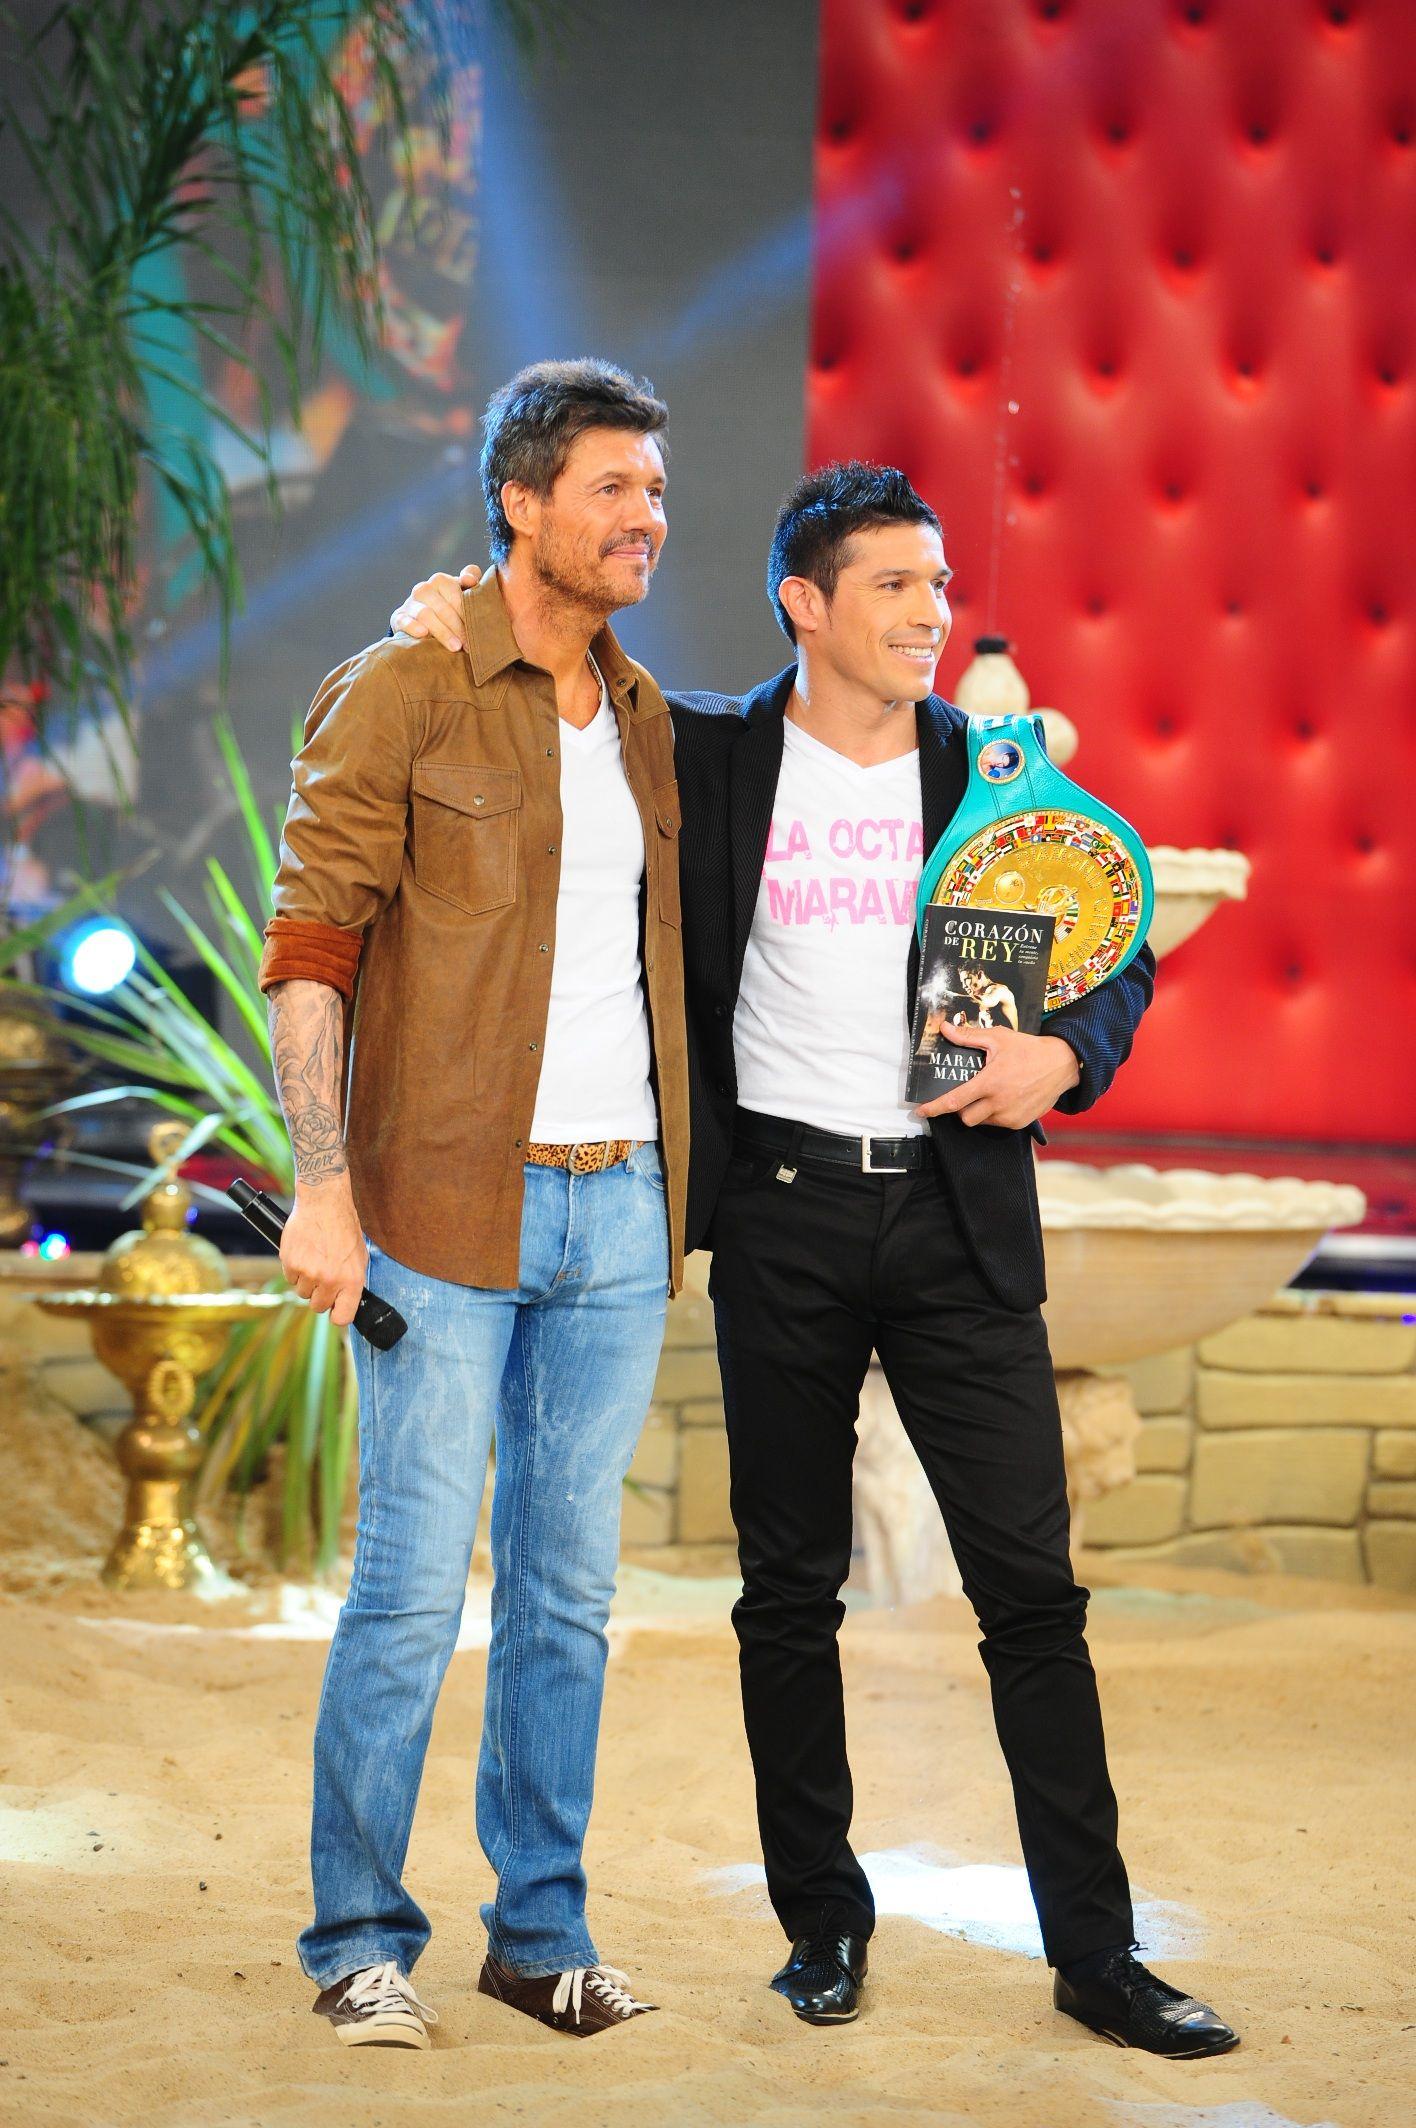 Maravilla Martínez con Tinelli: Mi próxima pelea será en Argentina